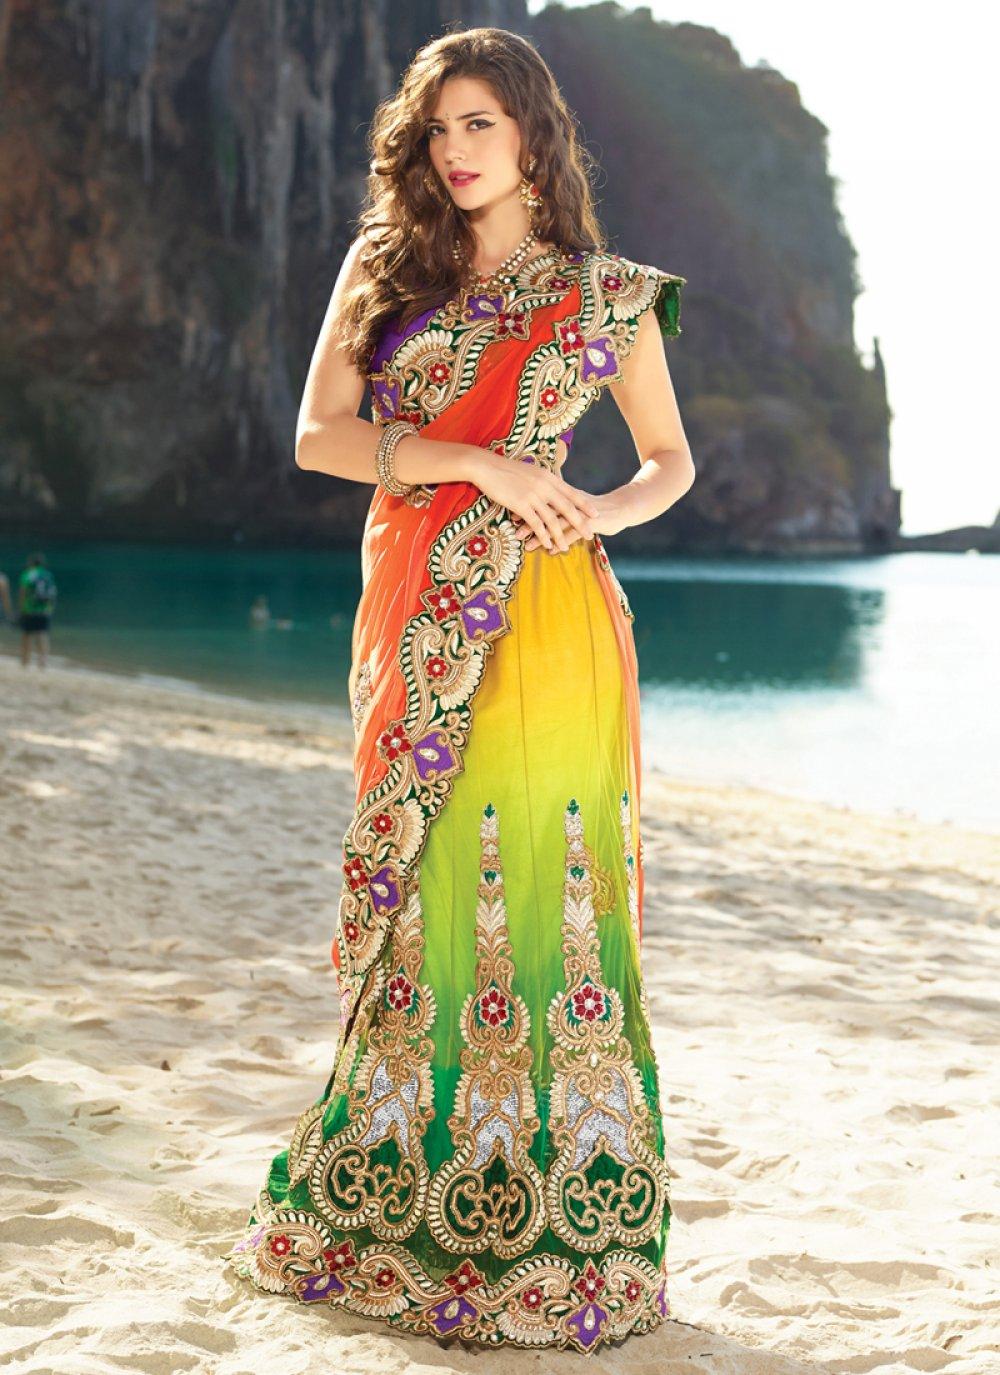 Aloe Vera Green, Coral & Gold Color Embroidered Lehenga Style Saree